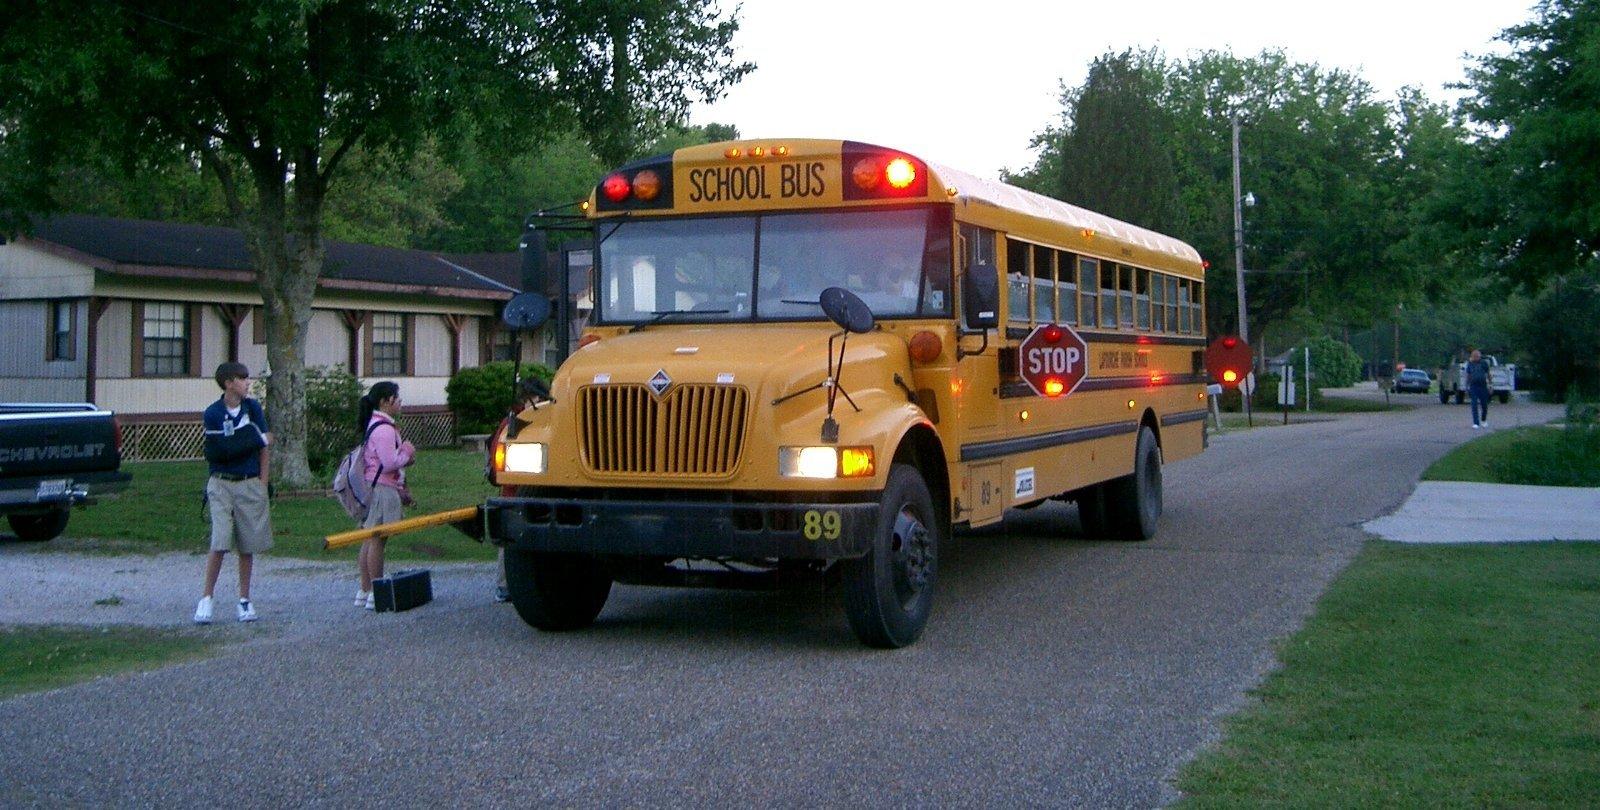 Children_about_to_board_the_school_bus_(Thibodaux,_Louisiana)